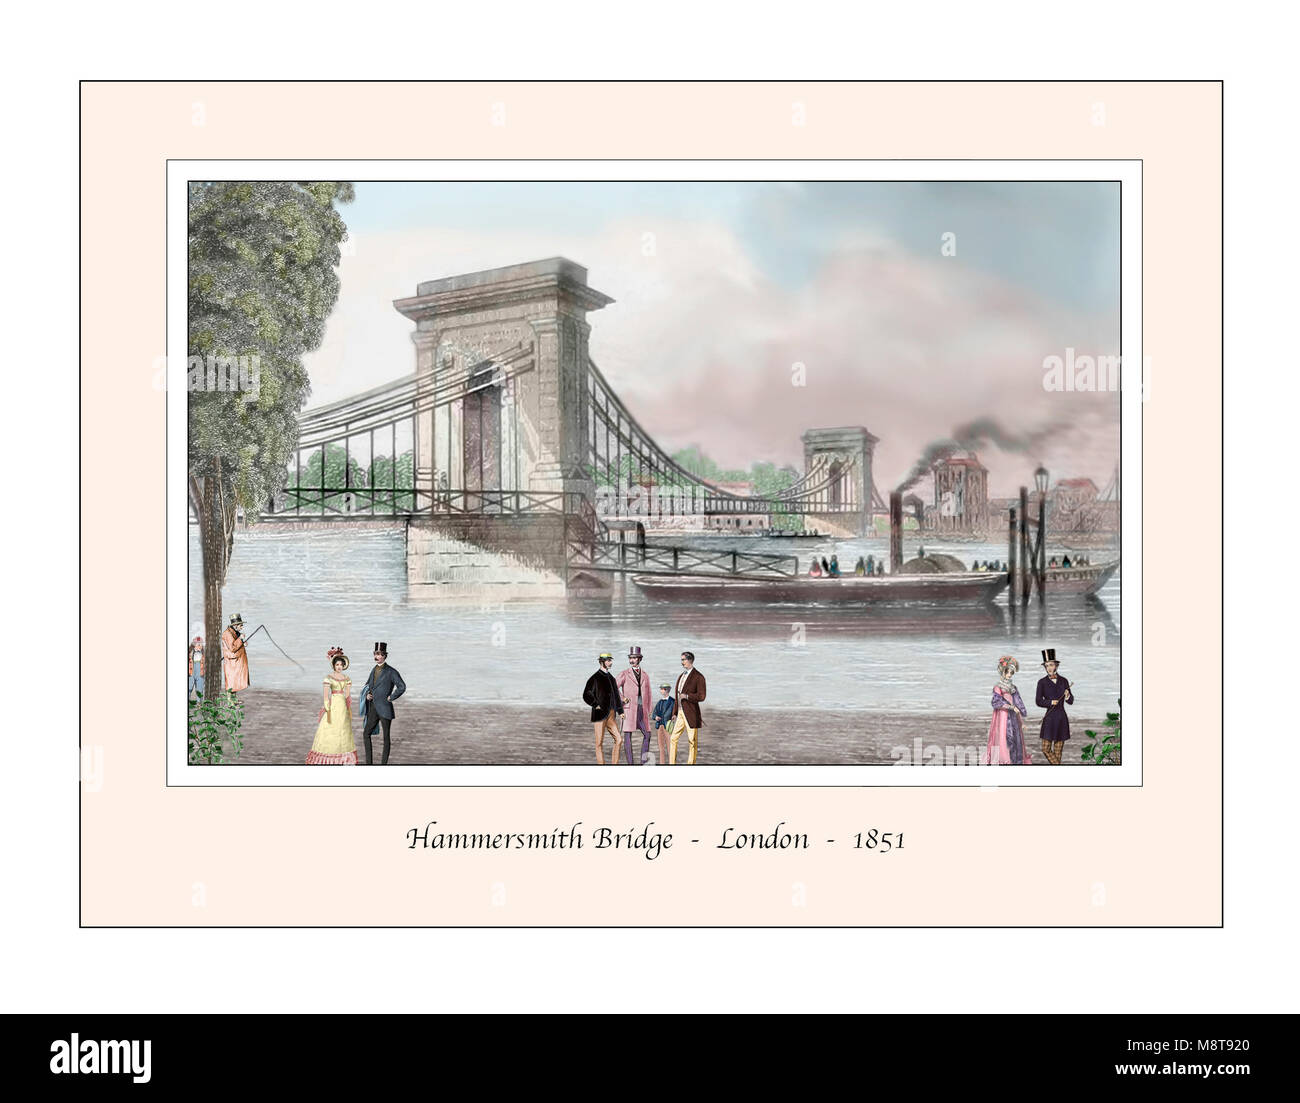 Hammersmith Bridge London Original Design based on a 19th century Engraving - Stock Image